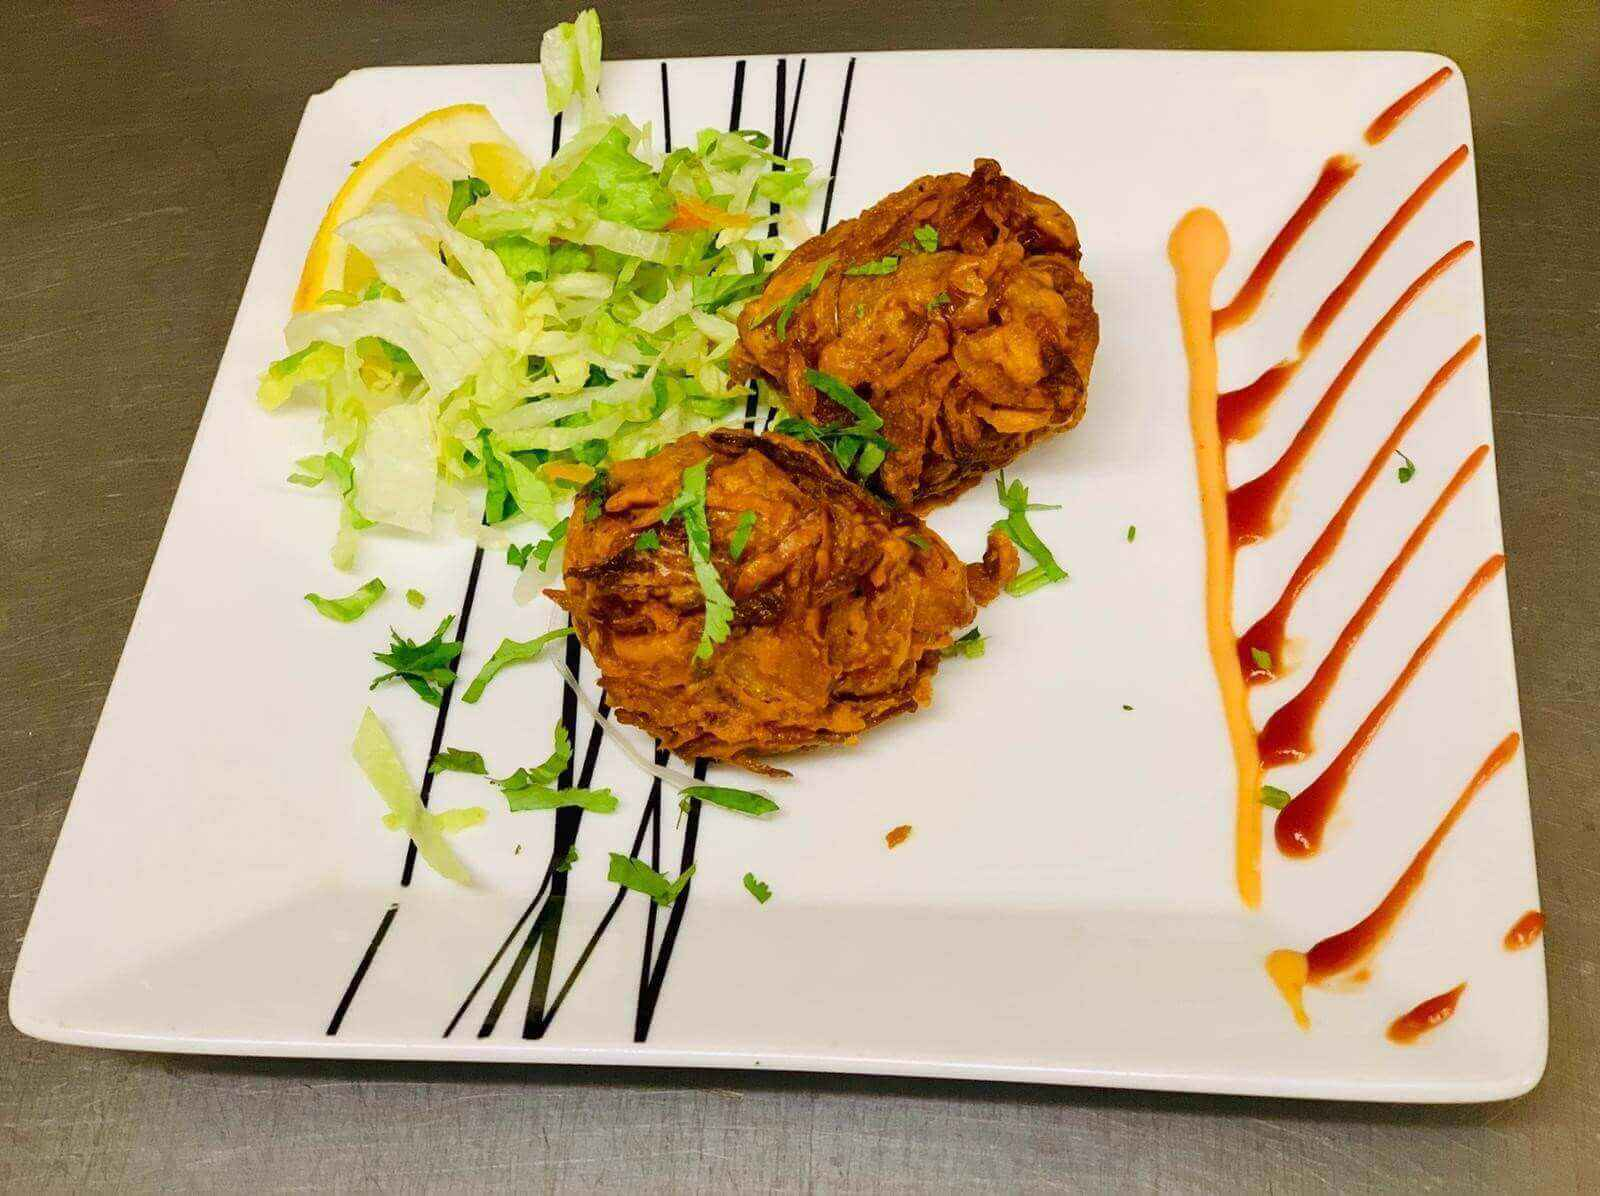 28. Indian food at khans restaurant battersea sw11